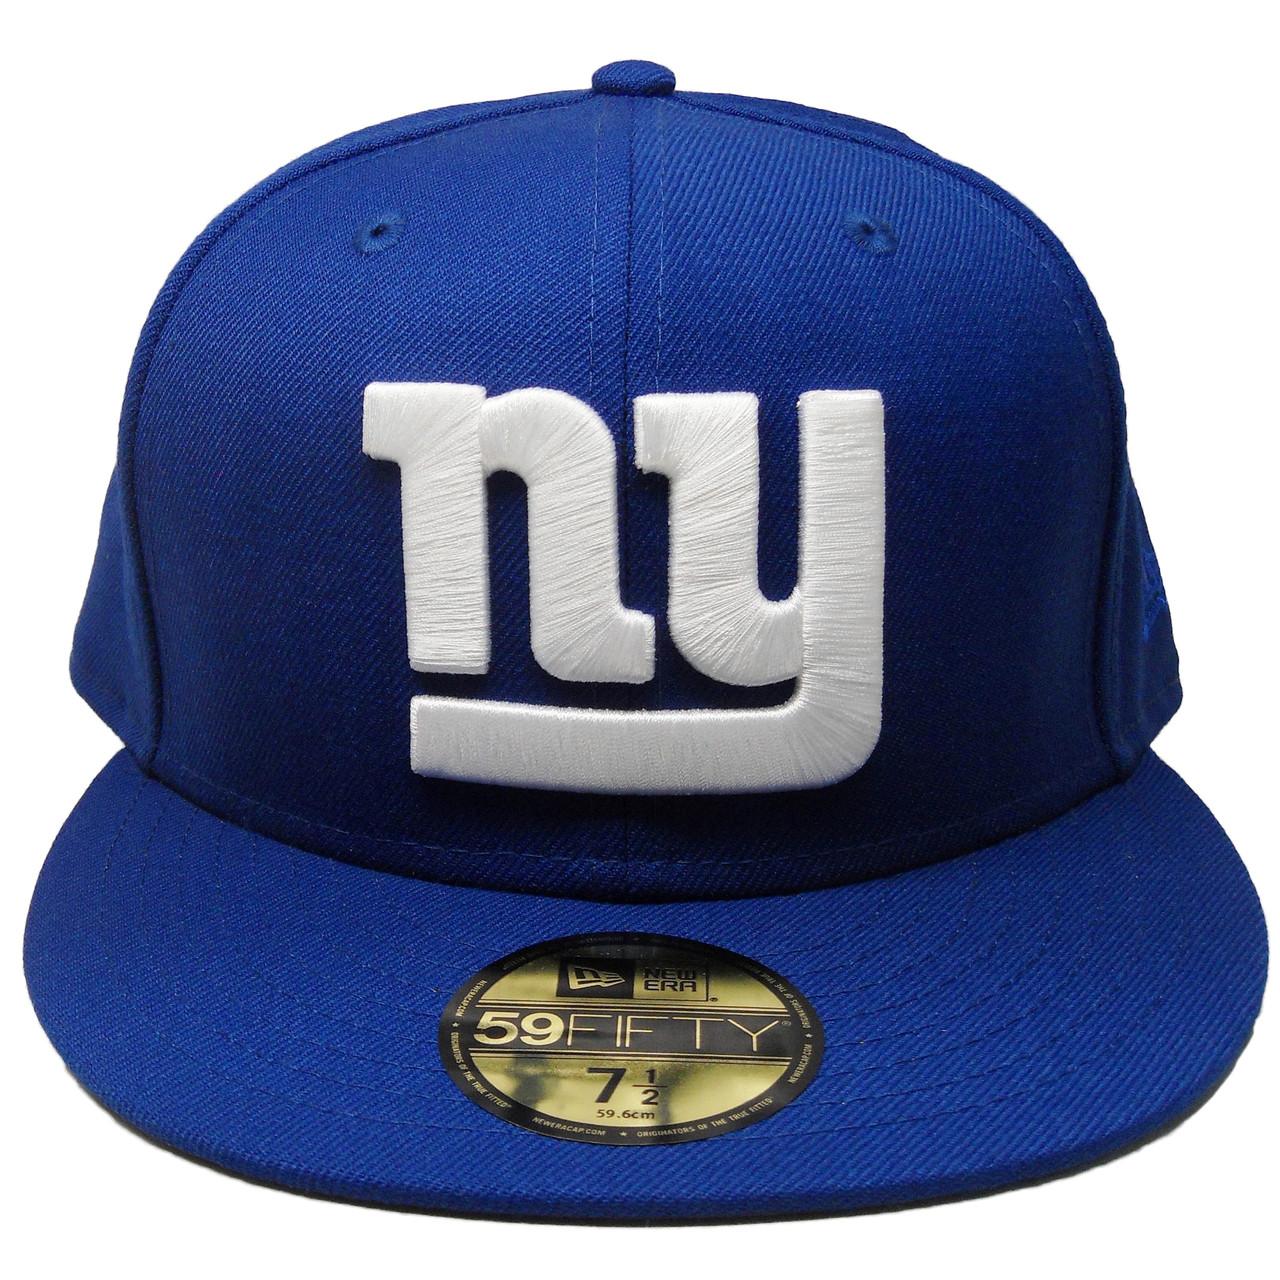 6759600c3c6 New York Giants New Era Custom New Era 59Fifty Fitted Hat - Royal ...